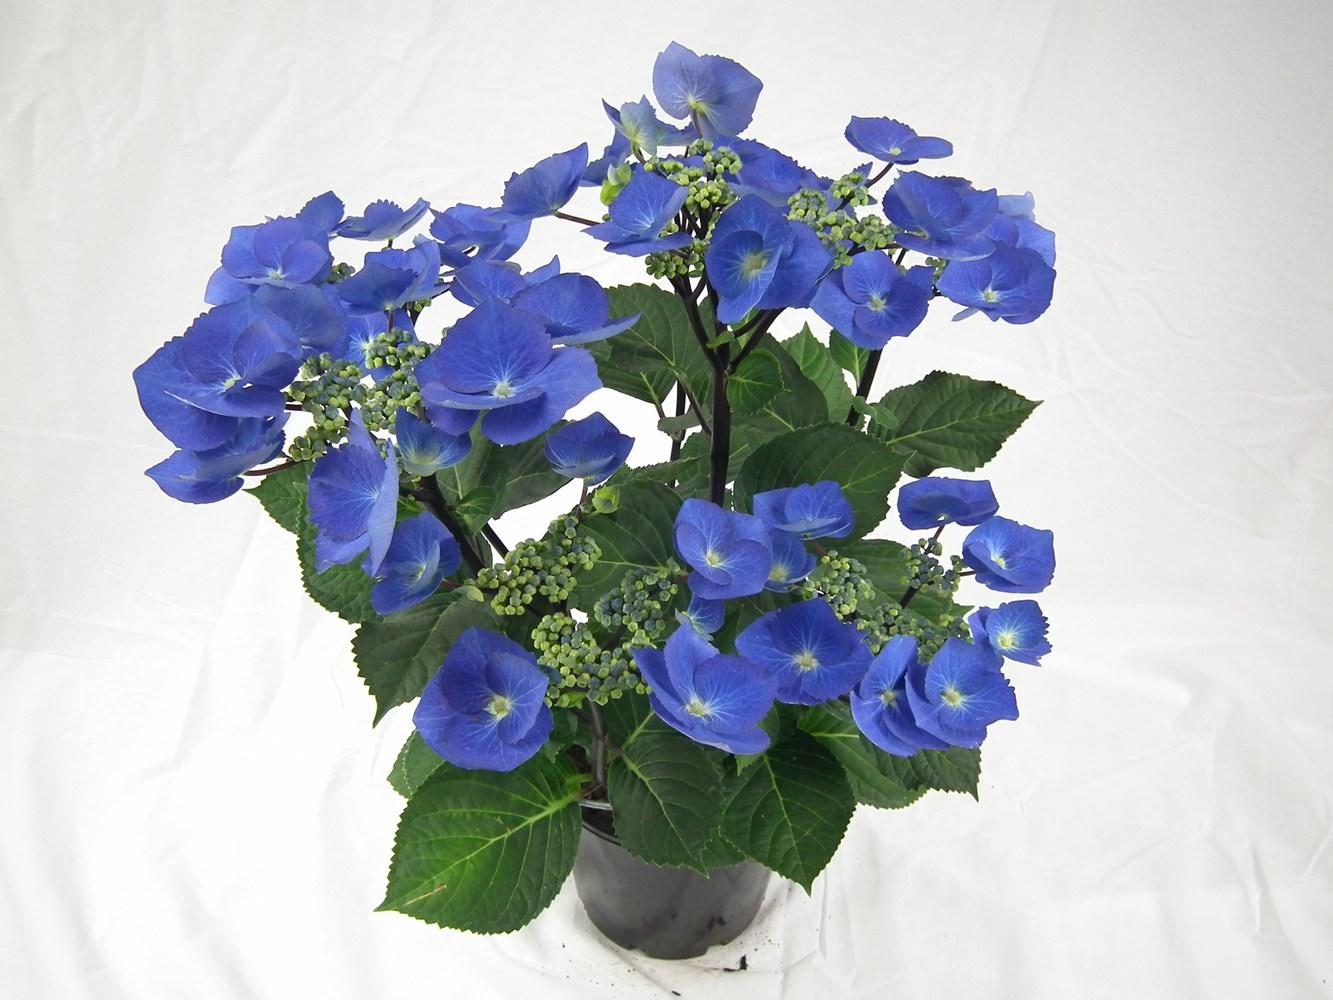 Website/Plants/2144398571/Images/Gallery/h_blacklace_03.0.JPG